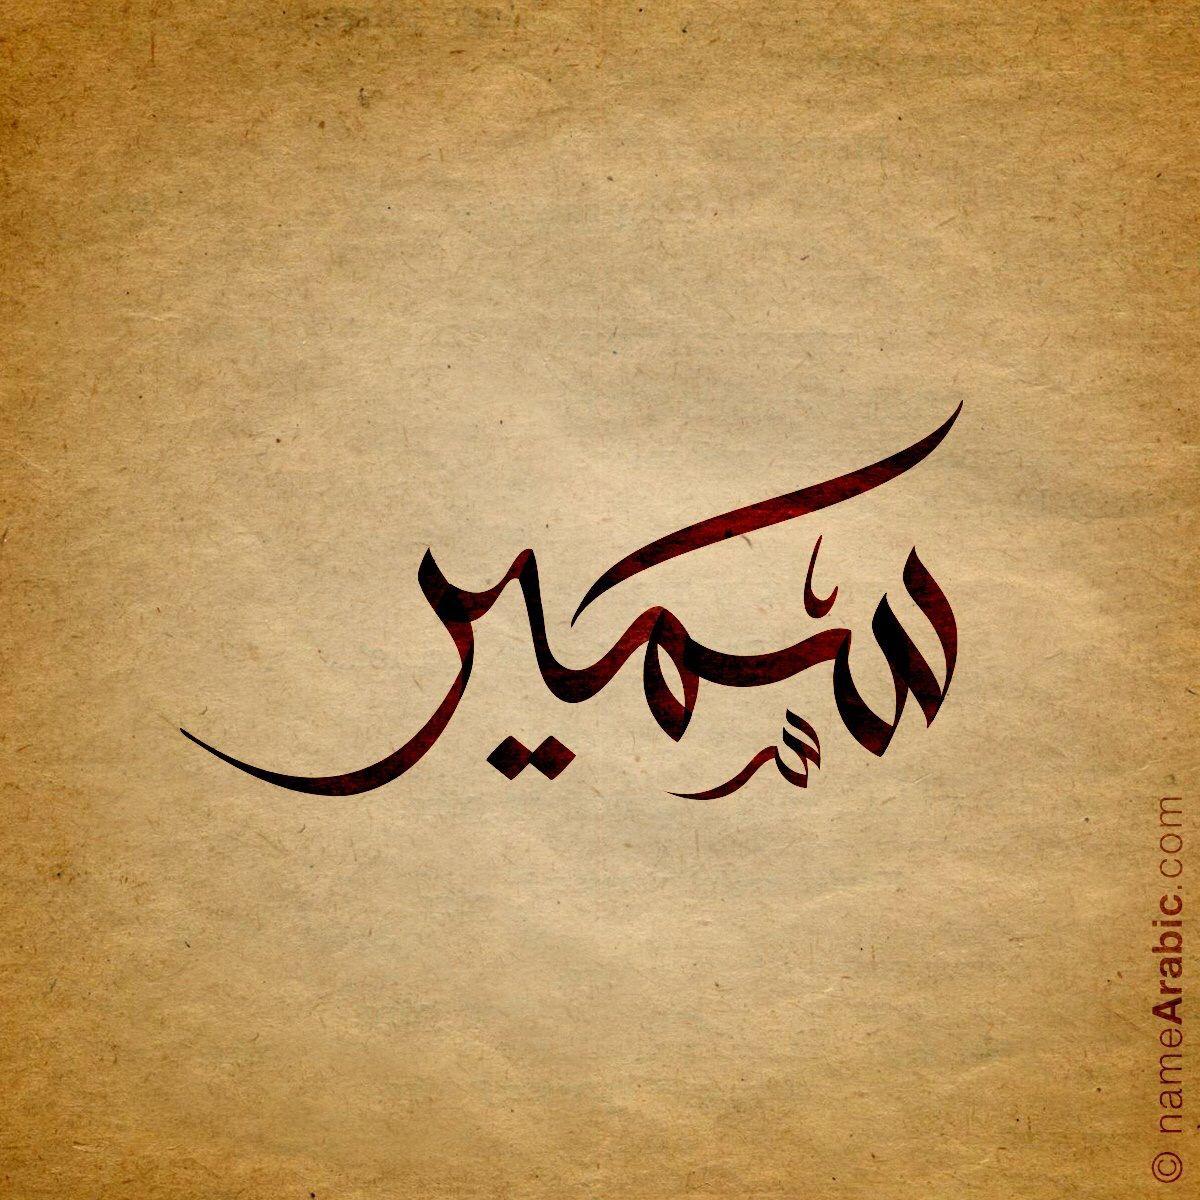 Железнодорожника, картинки с надписью фатима по арабски